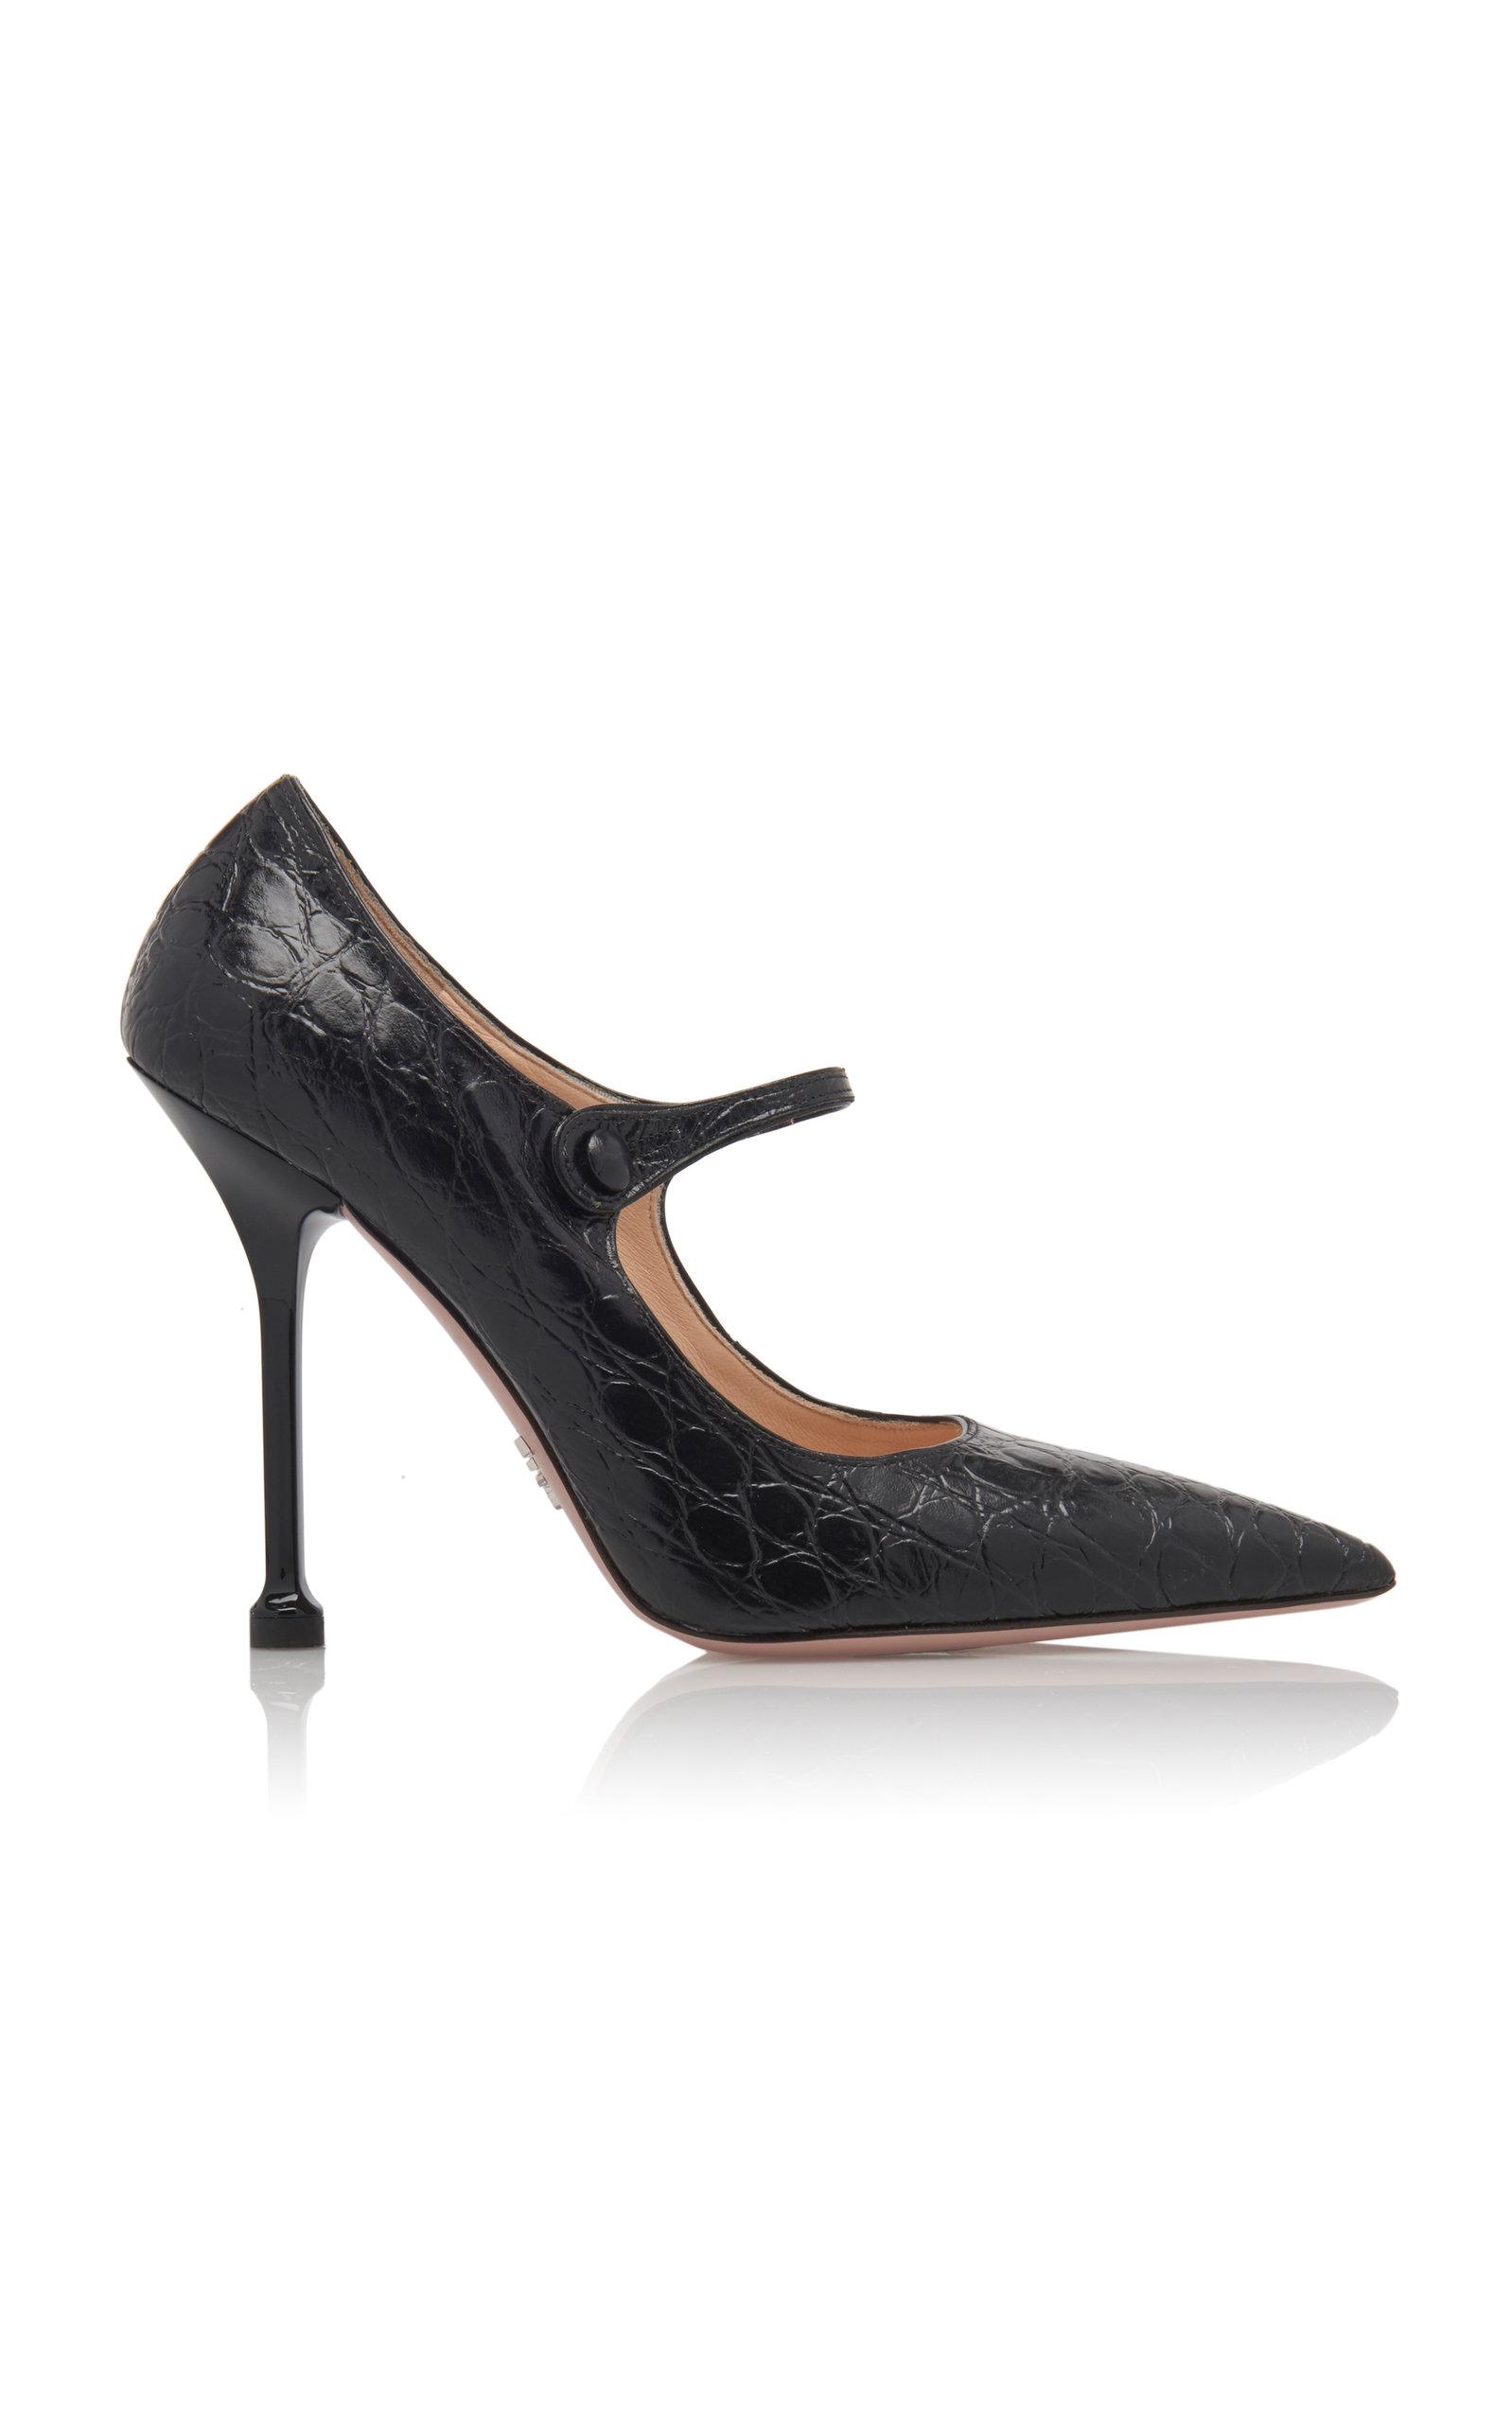 f30c0033cbbf0 Embossed Stiletto Mary Jane Pumps